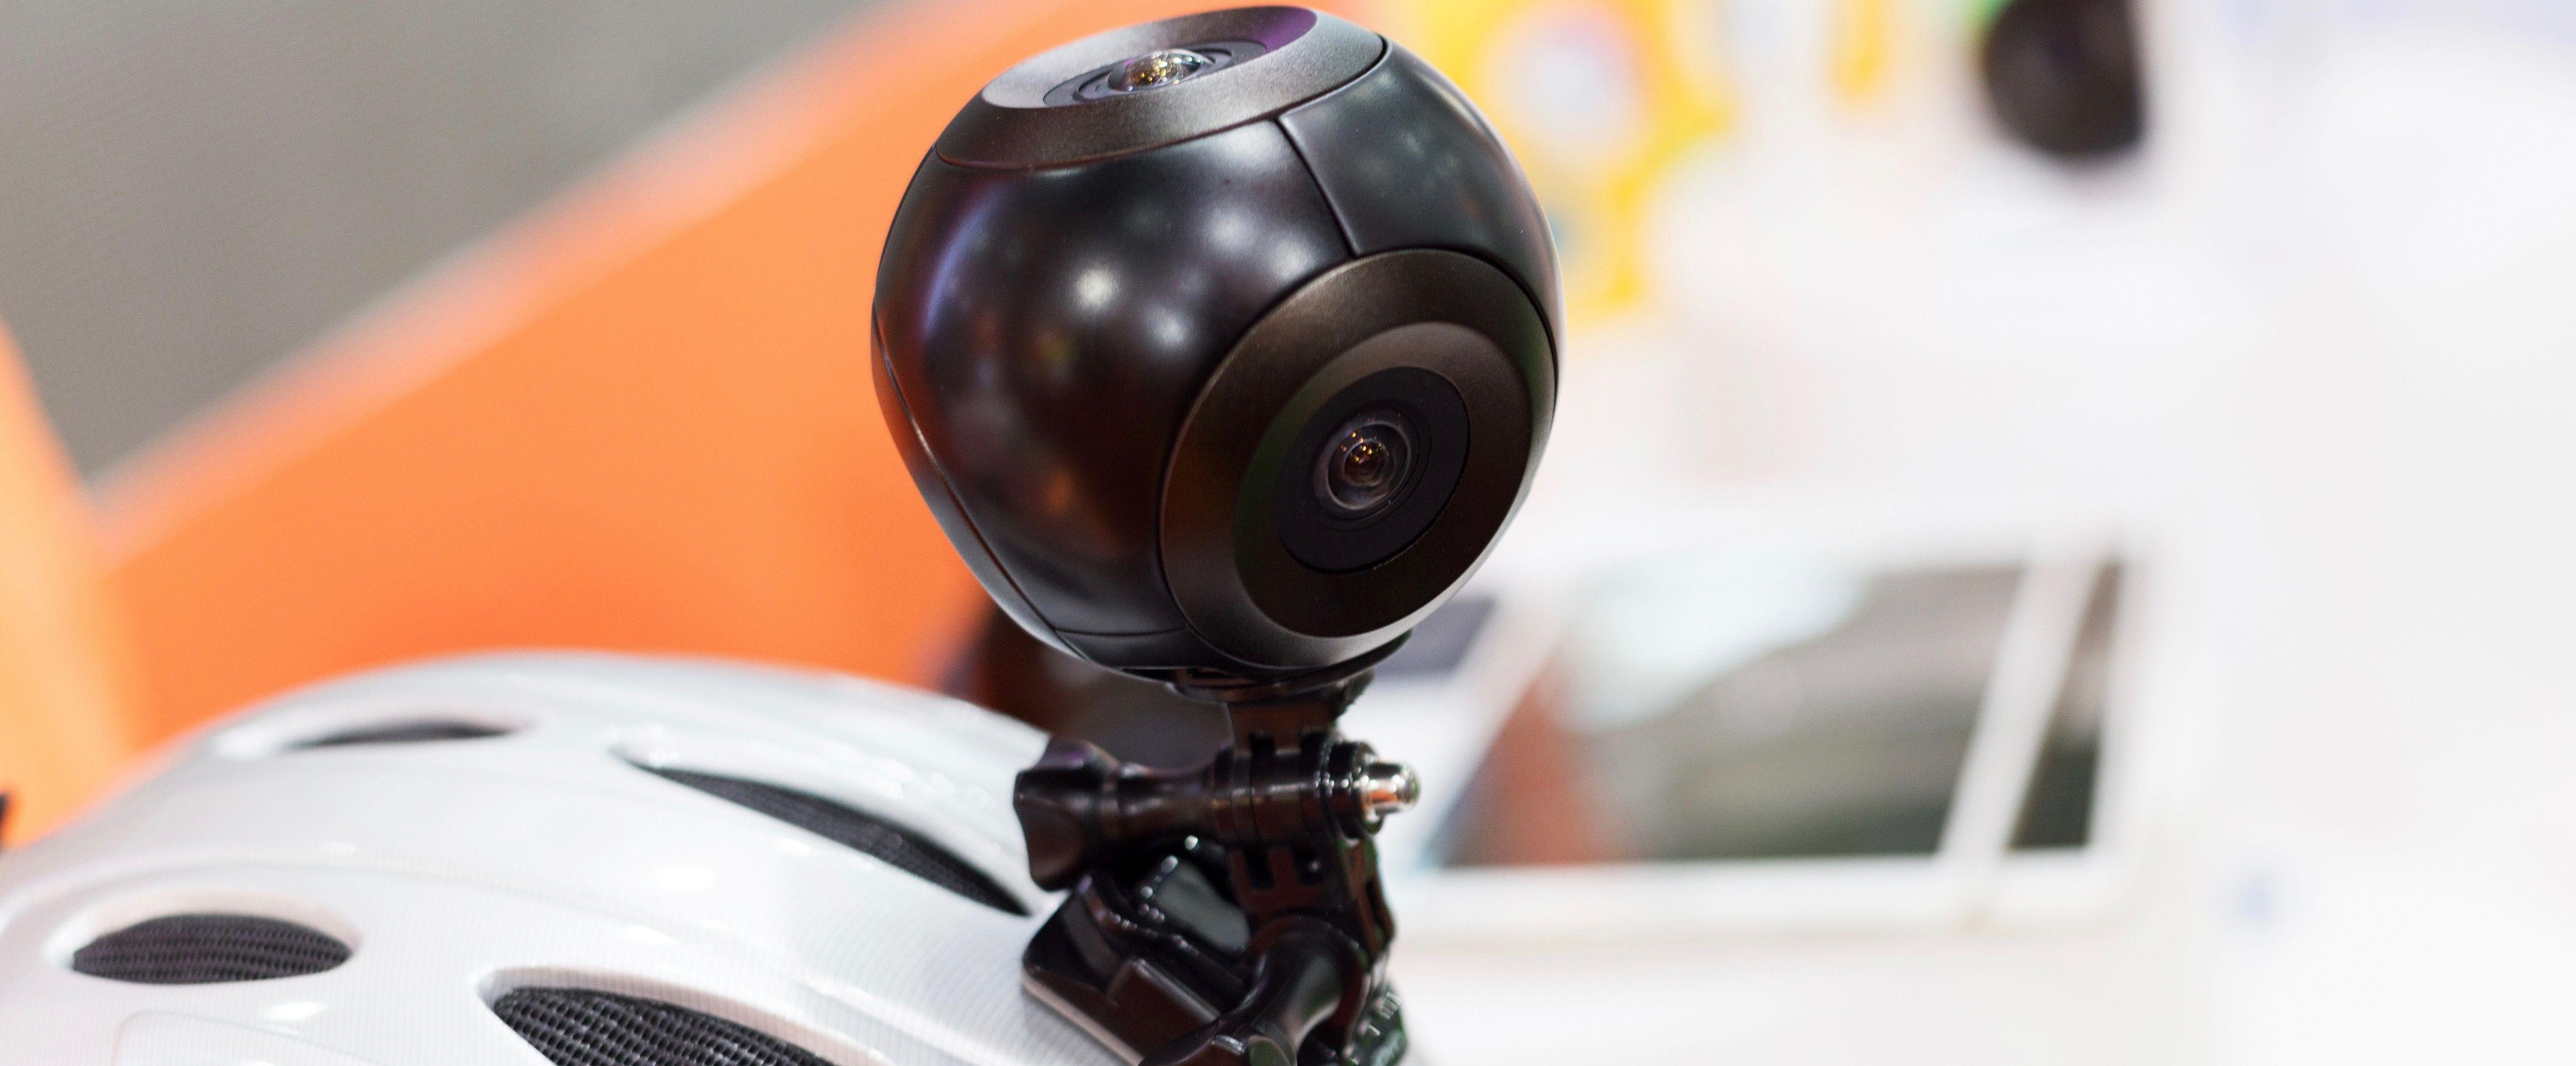 360-video-camera-compressor.jpg